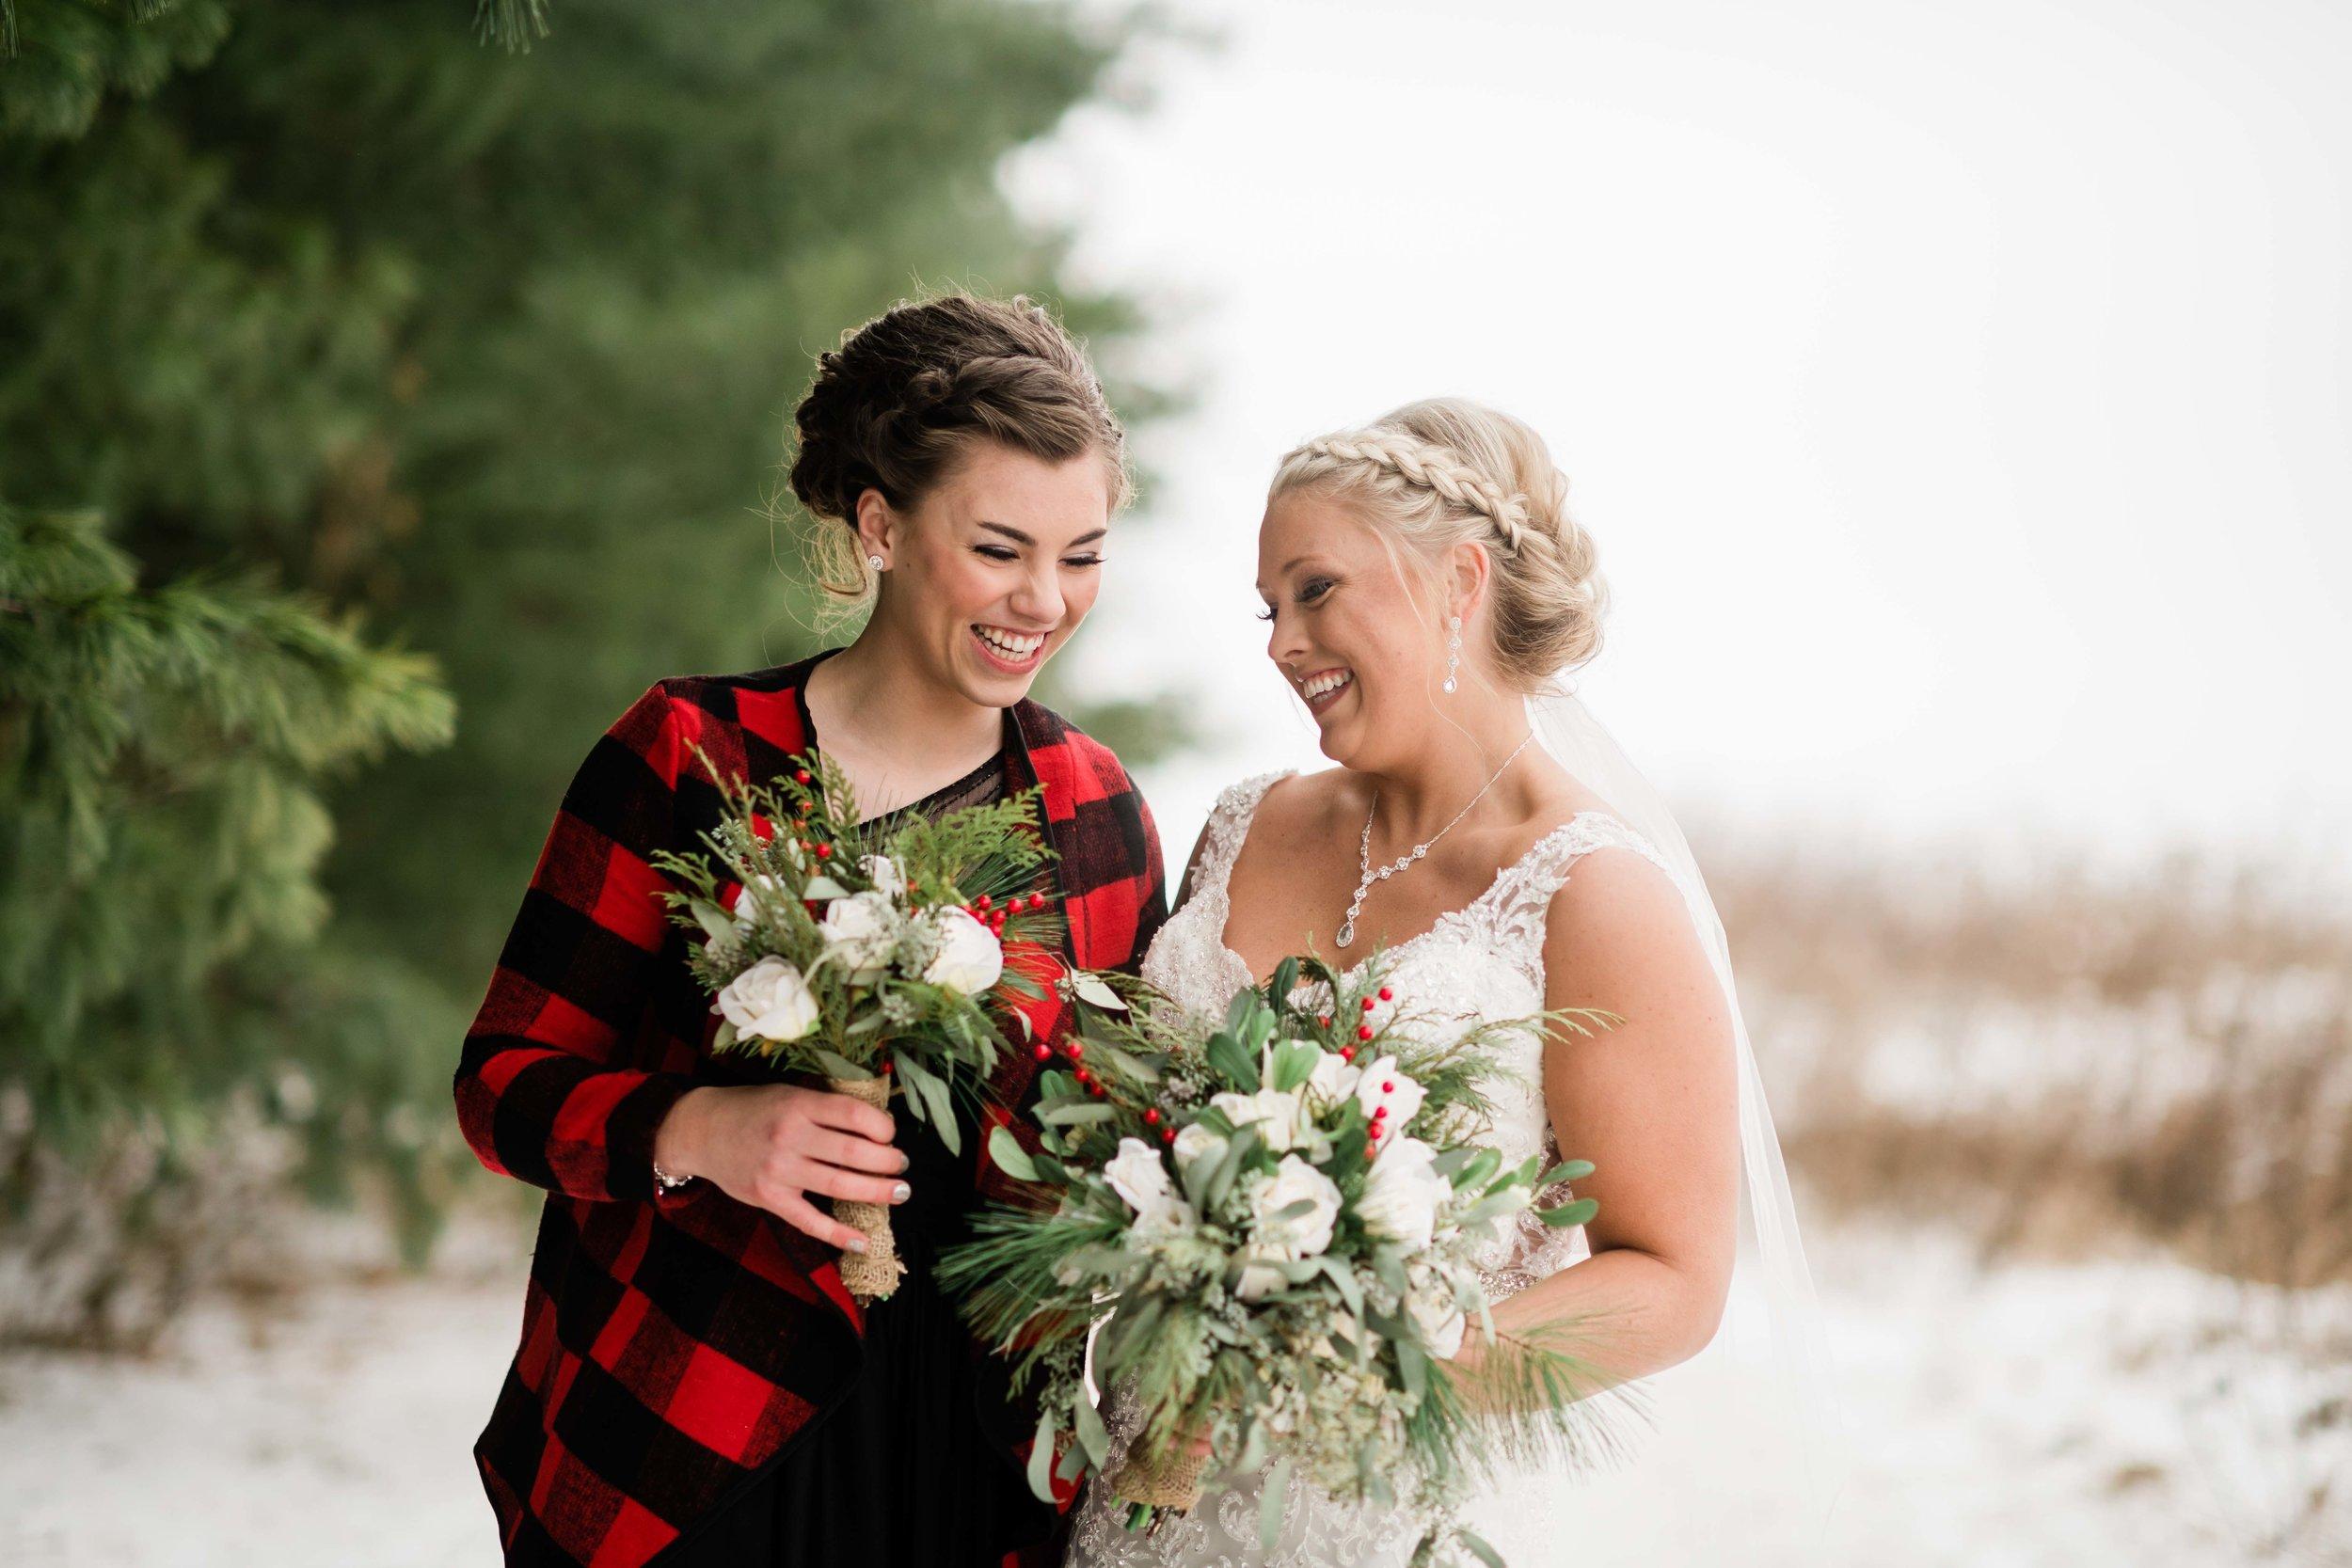 Bride and bridesmaid laugh